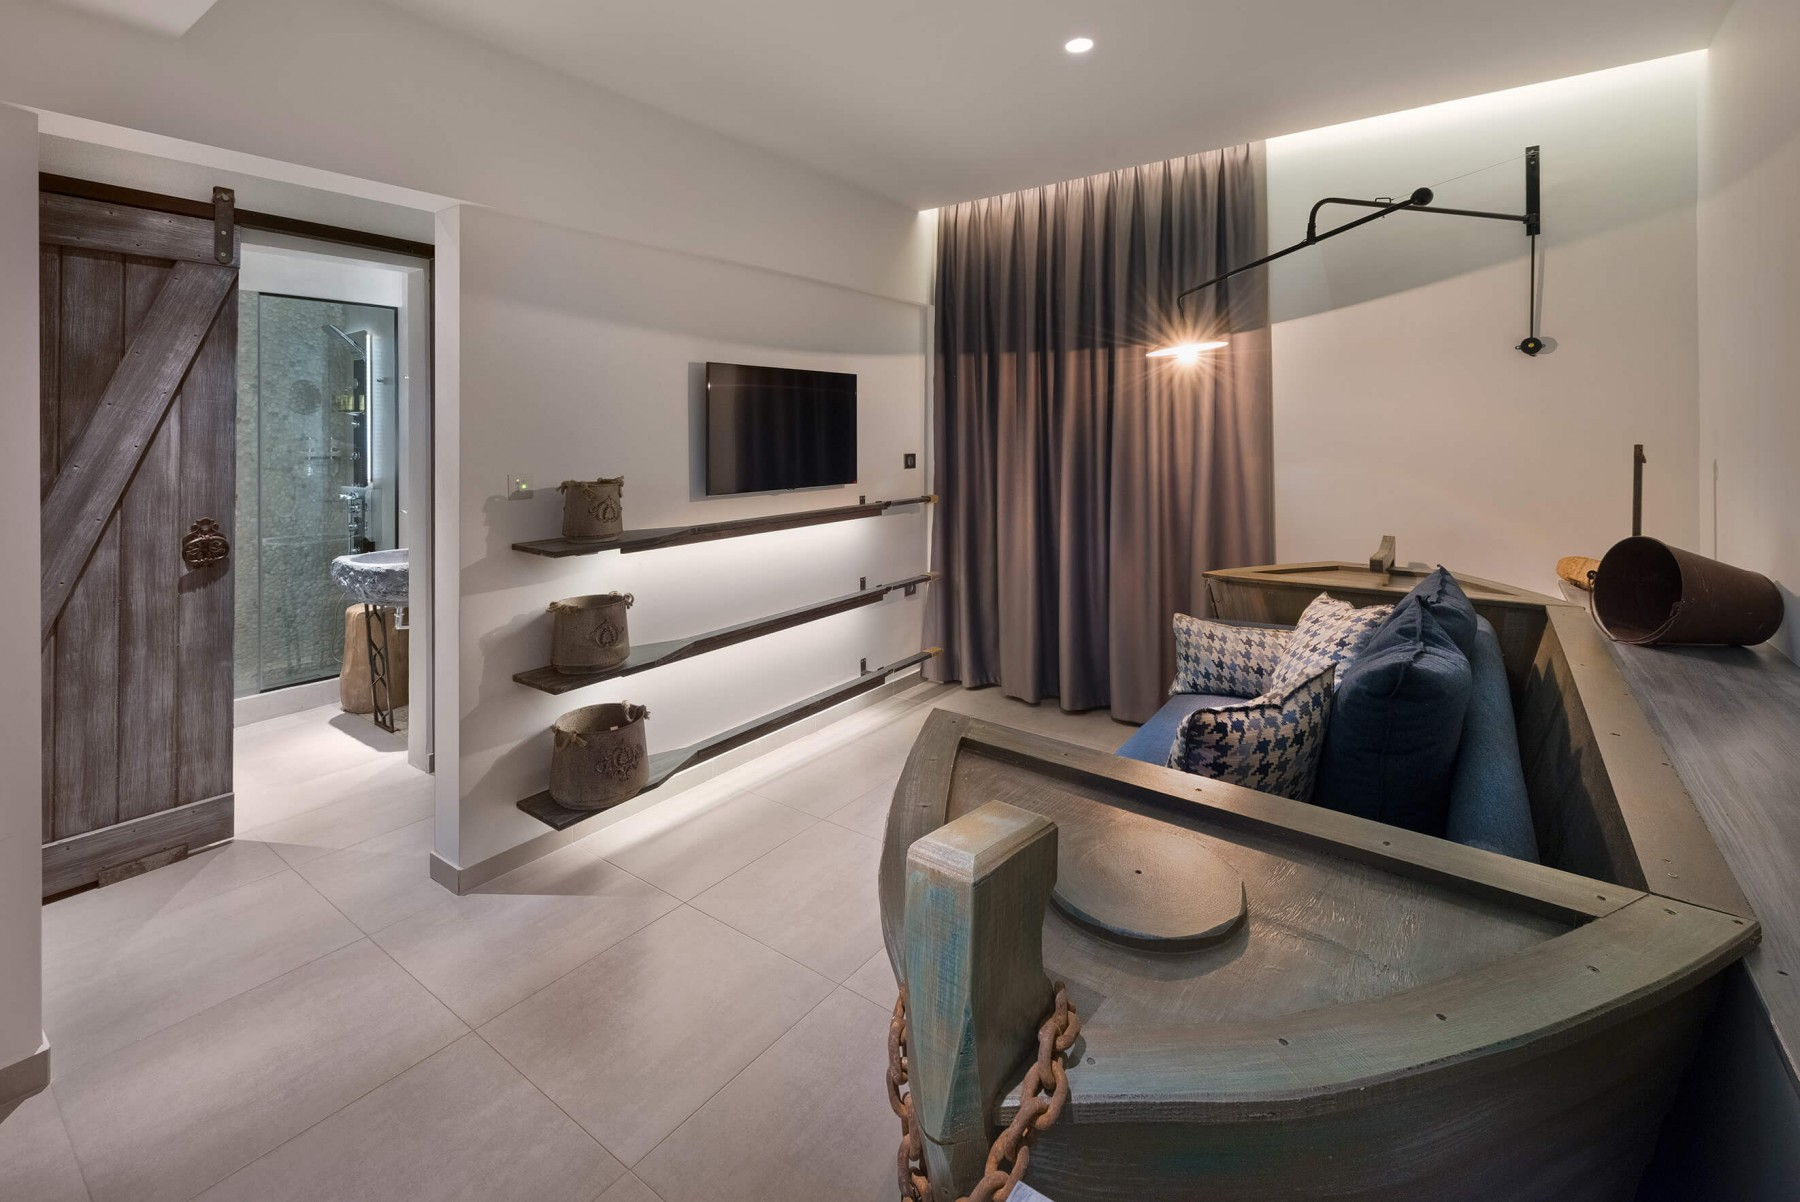 Kavos Suite Living Room - Elakati Luxury Boutique Hotel in Rhodes